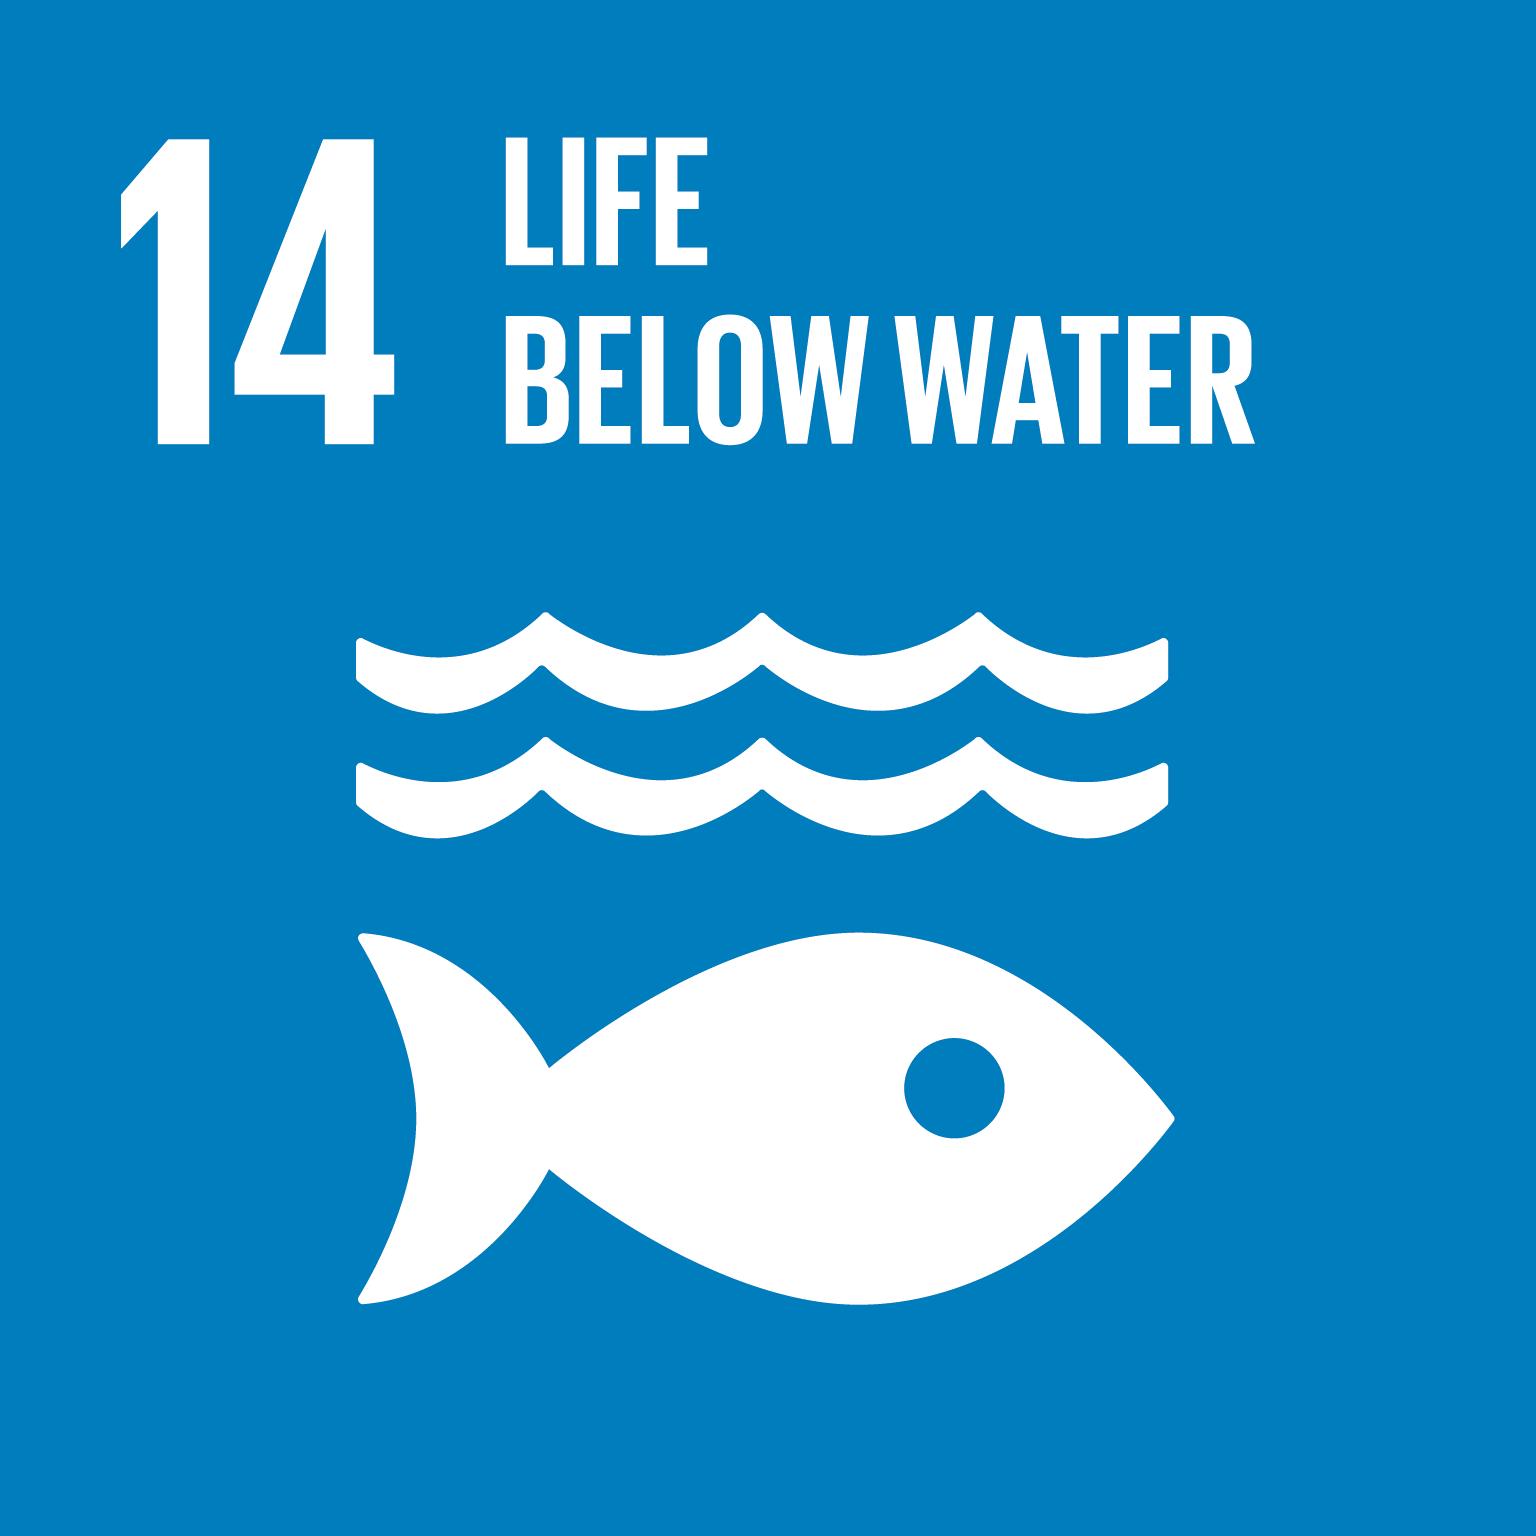 SDG Goal #14 Life Below Water